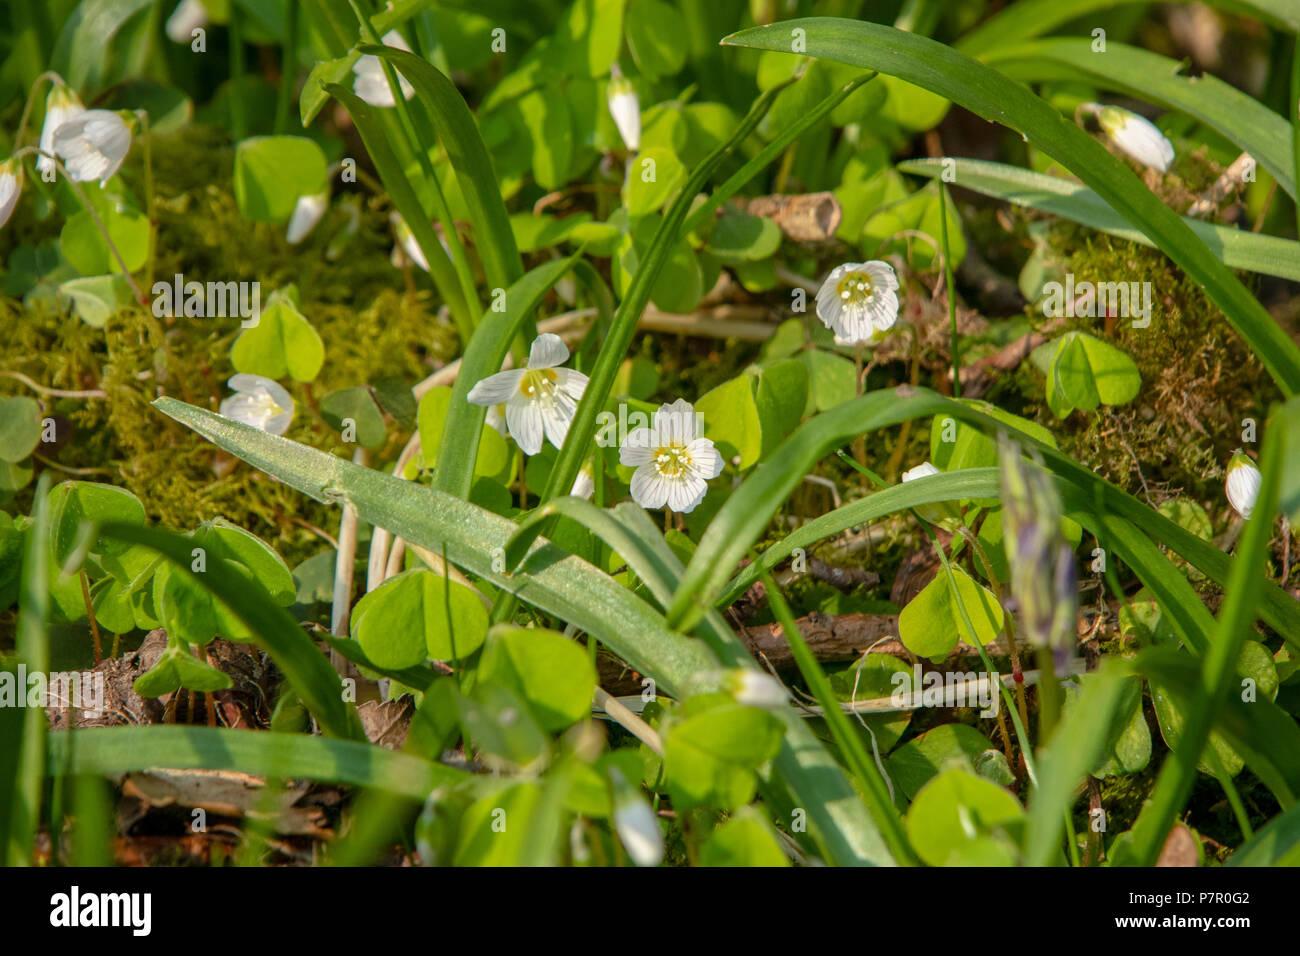 Wood sorrel flowering in woodland in spring - Stock Image